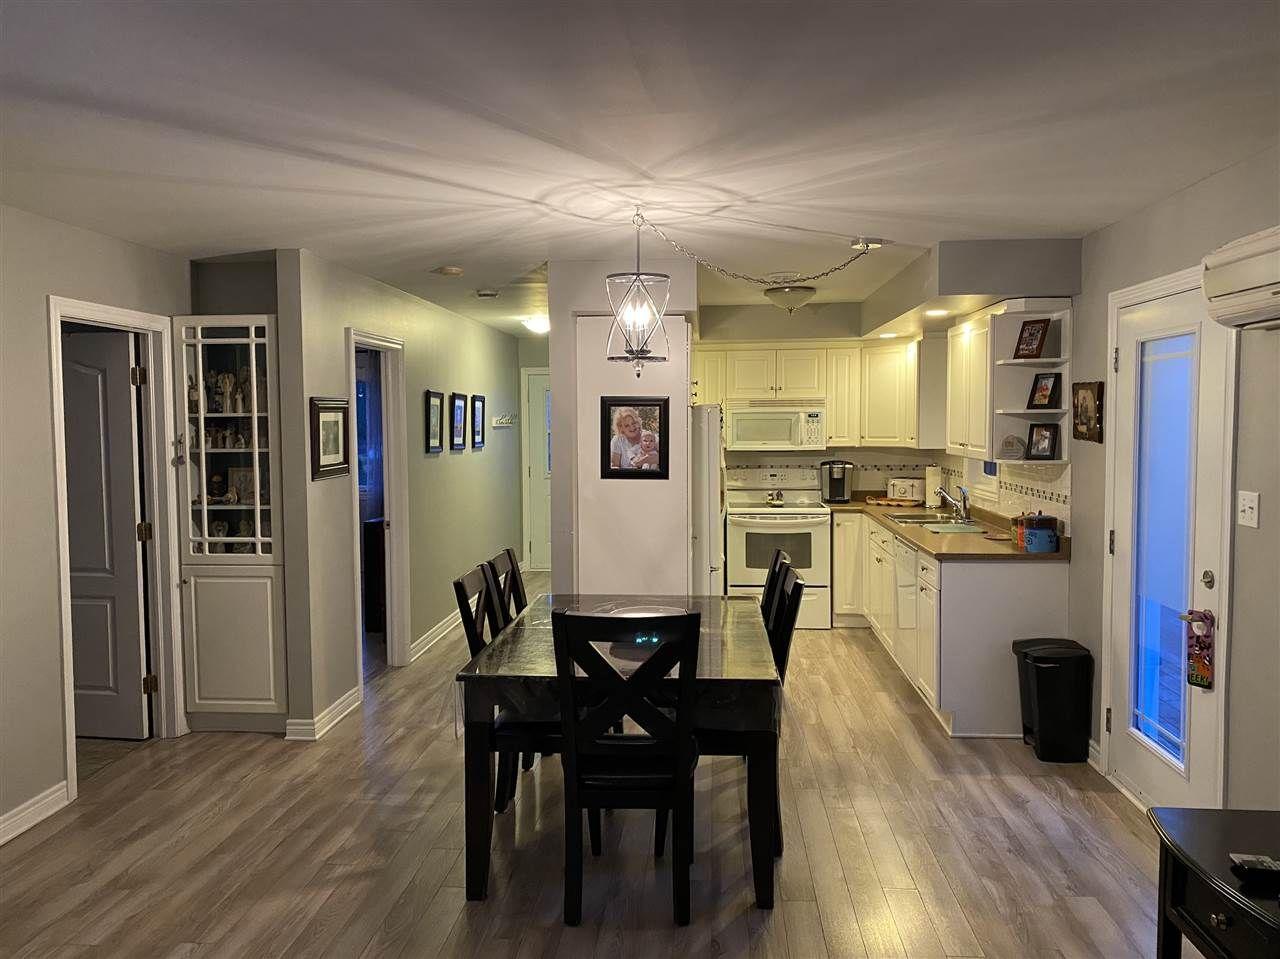 Photo 5: Photos: 7327 Main Street in Louisbourg: 206-Louisbourg Residential for sale (Cape Breton)  : MLS®# 202025505